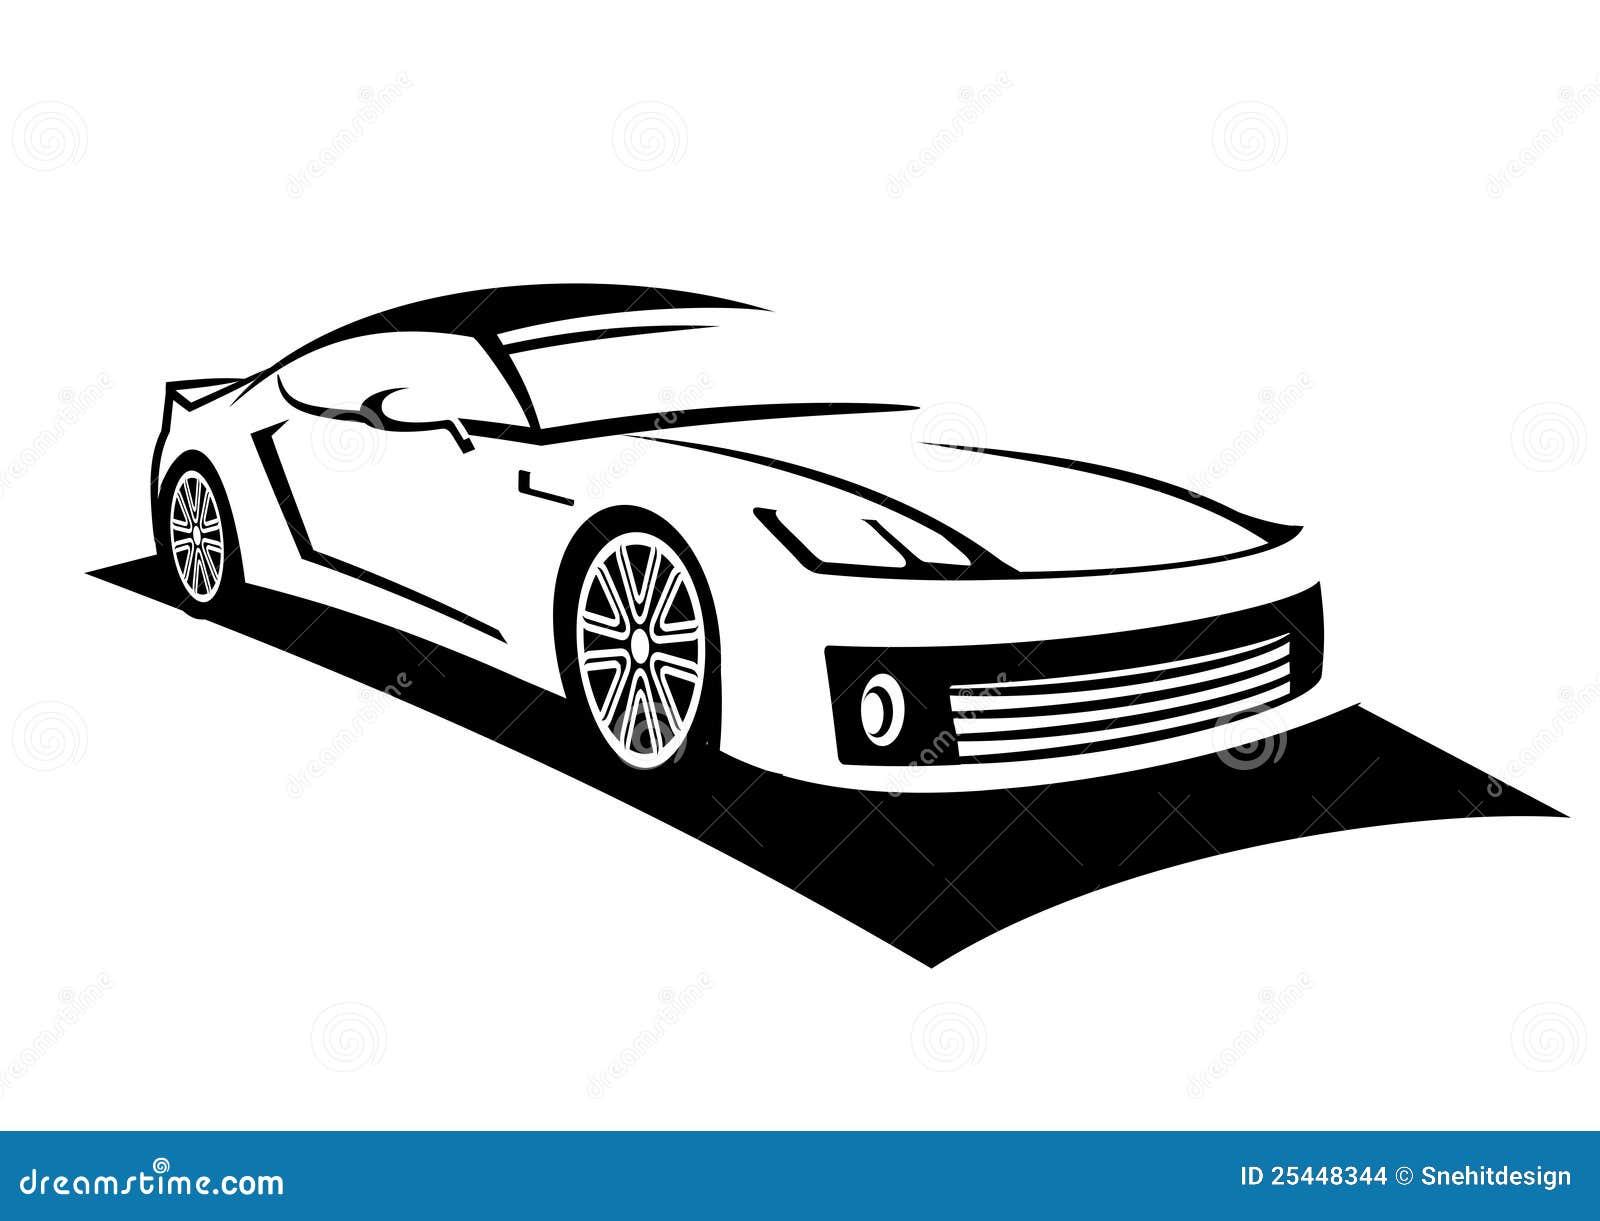 Line Art Car : Car line art stock illustration of sport